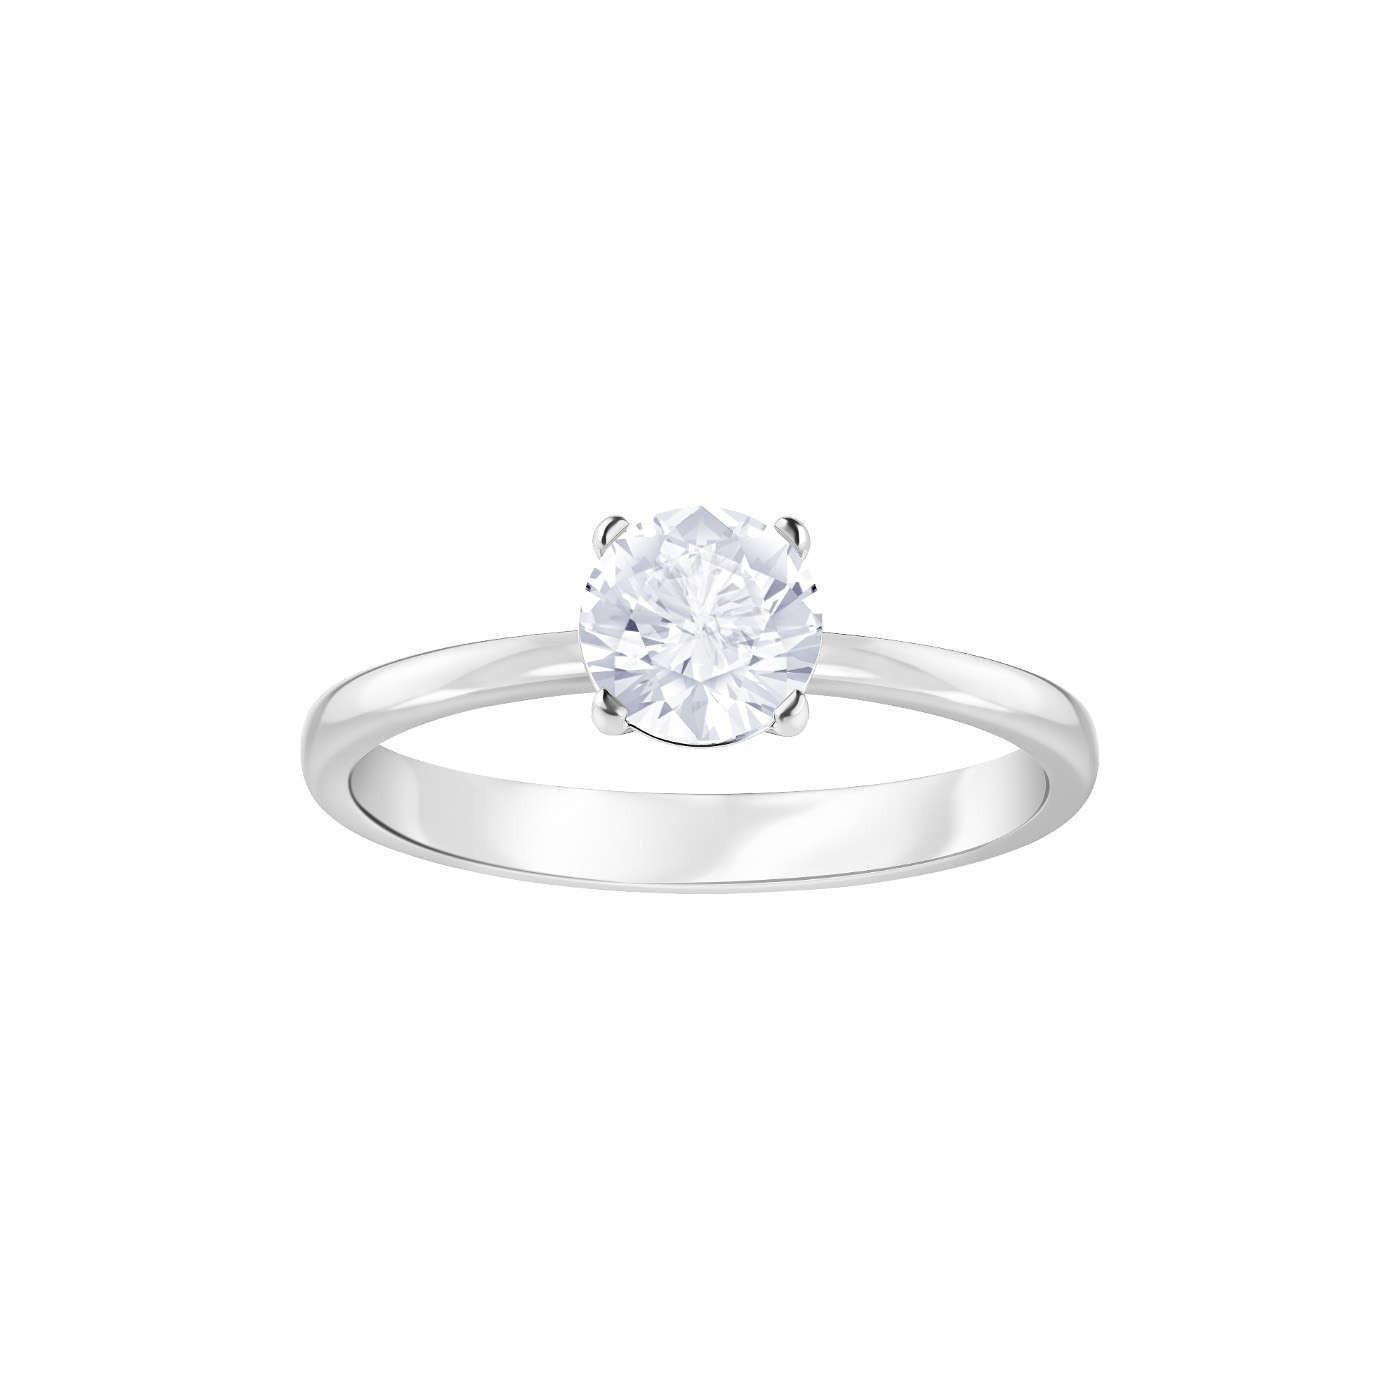 Swarovski Attract Ring Round-cubic-zirkonia-white - Jewelry 045df95a4c